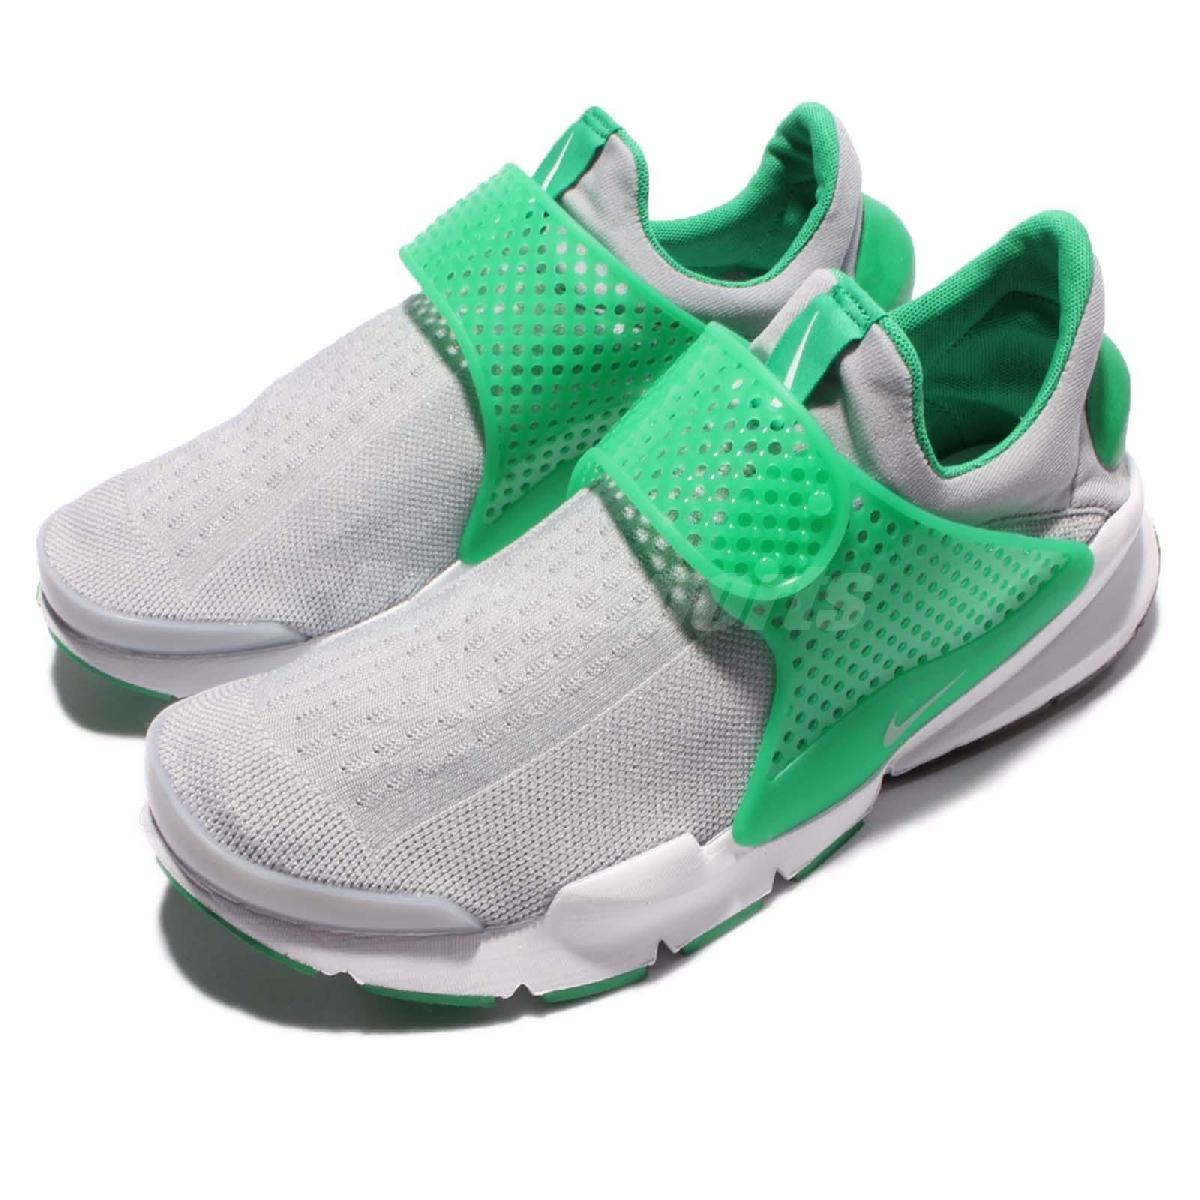 Nike Sock Dart KJCRD灰綠白底襪套式運動鞋襪子男鞋PUMP306 819686-004